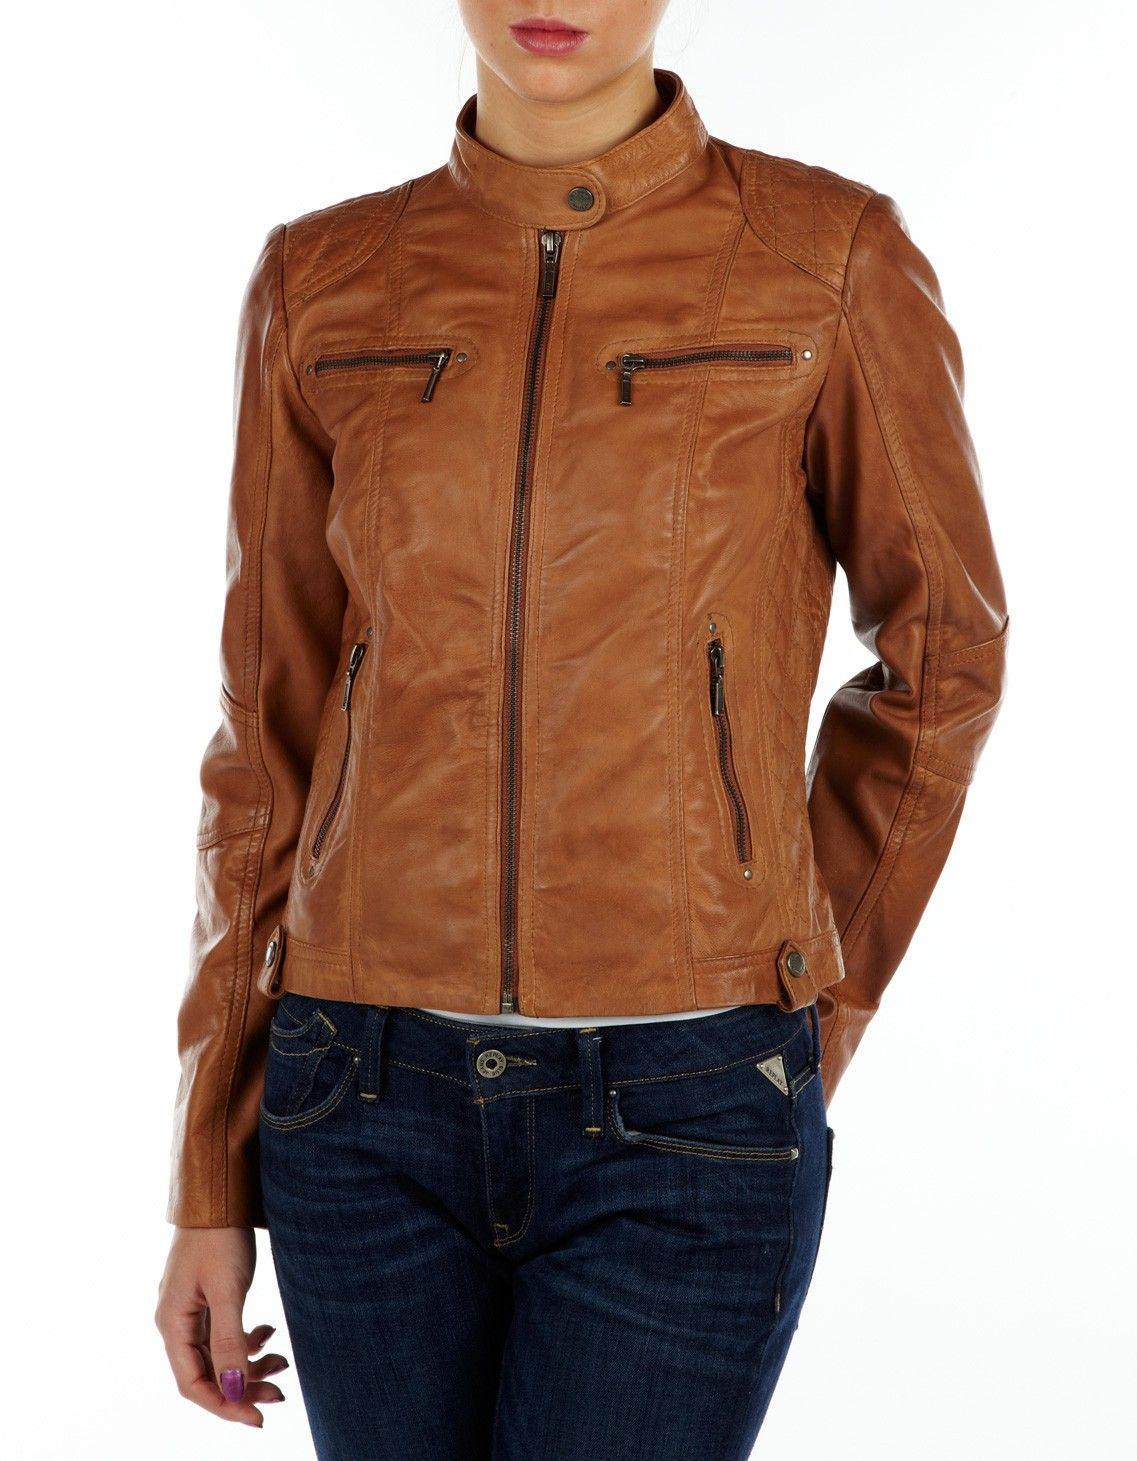 Helium Leather Biker Jacket Tan Leather jackets